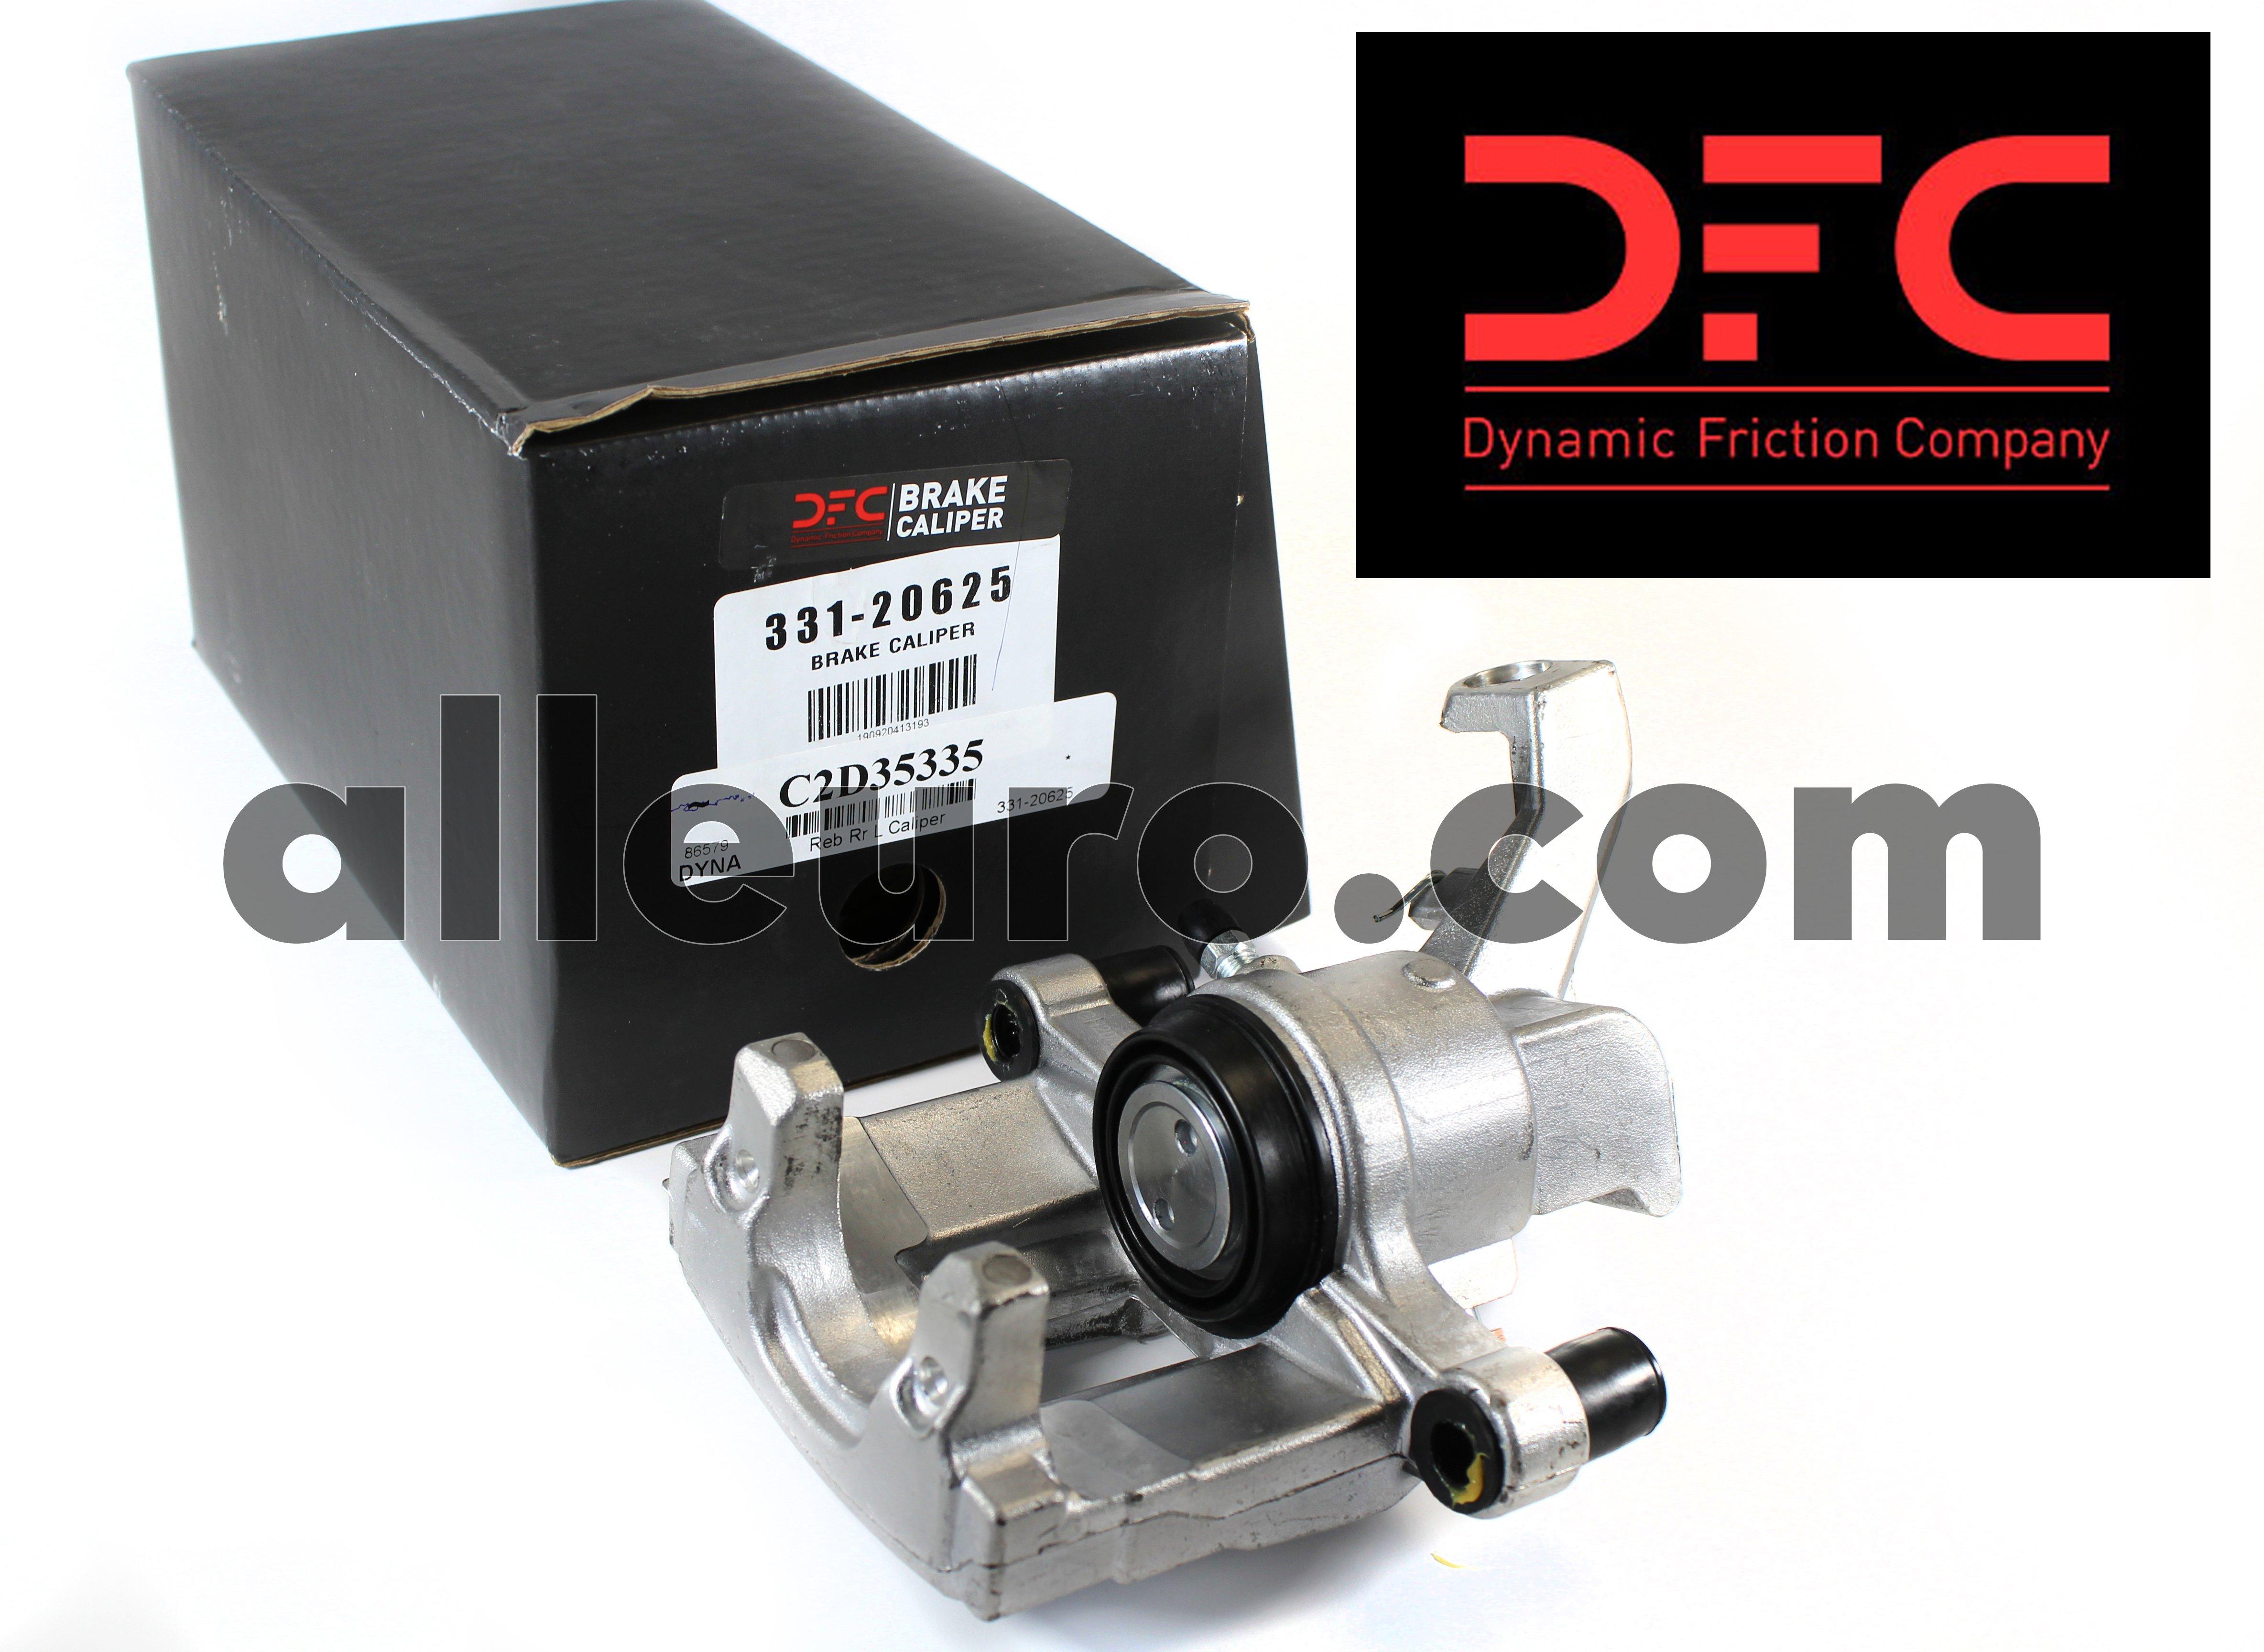 Dynamic Friction Rear Left Disc Brake Caliper C2D35335 331-20625